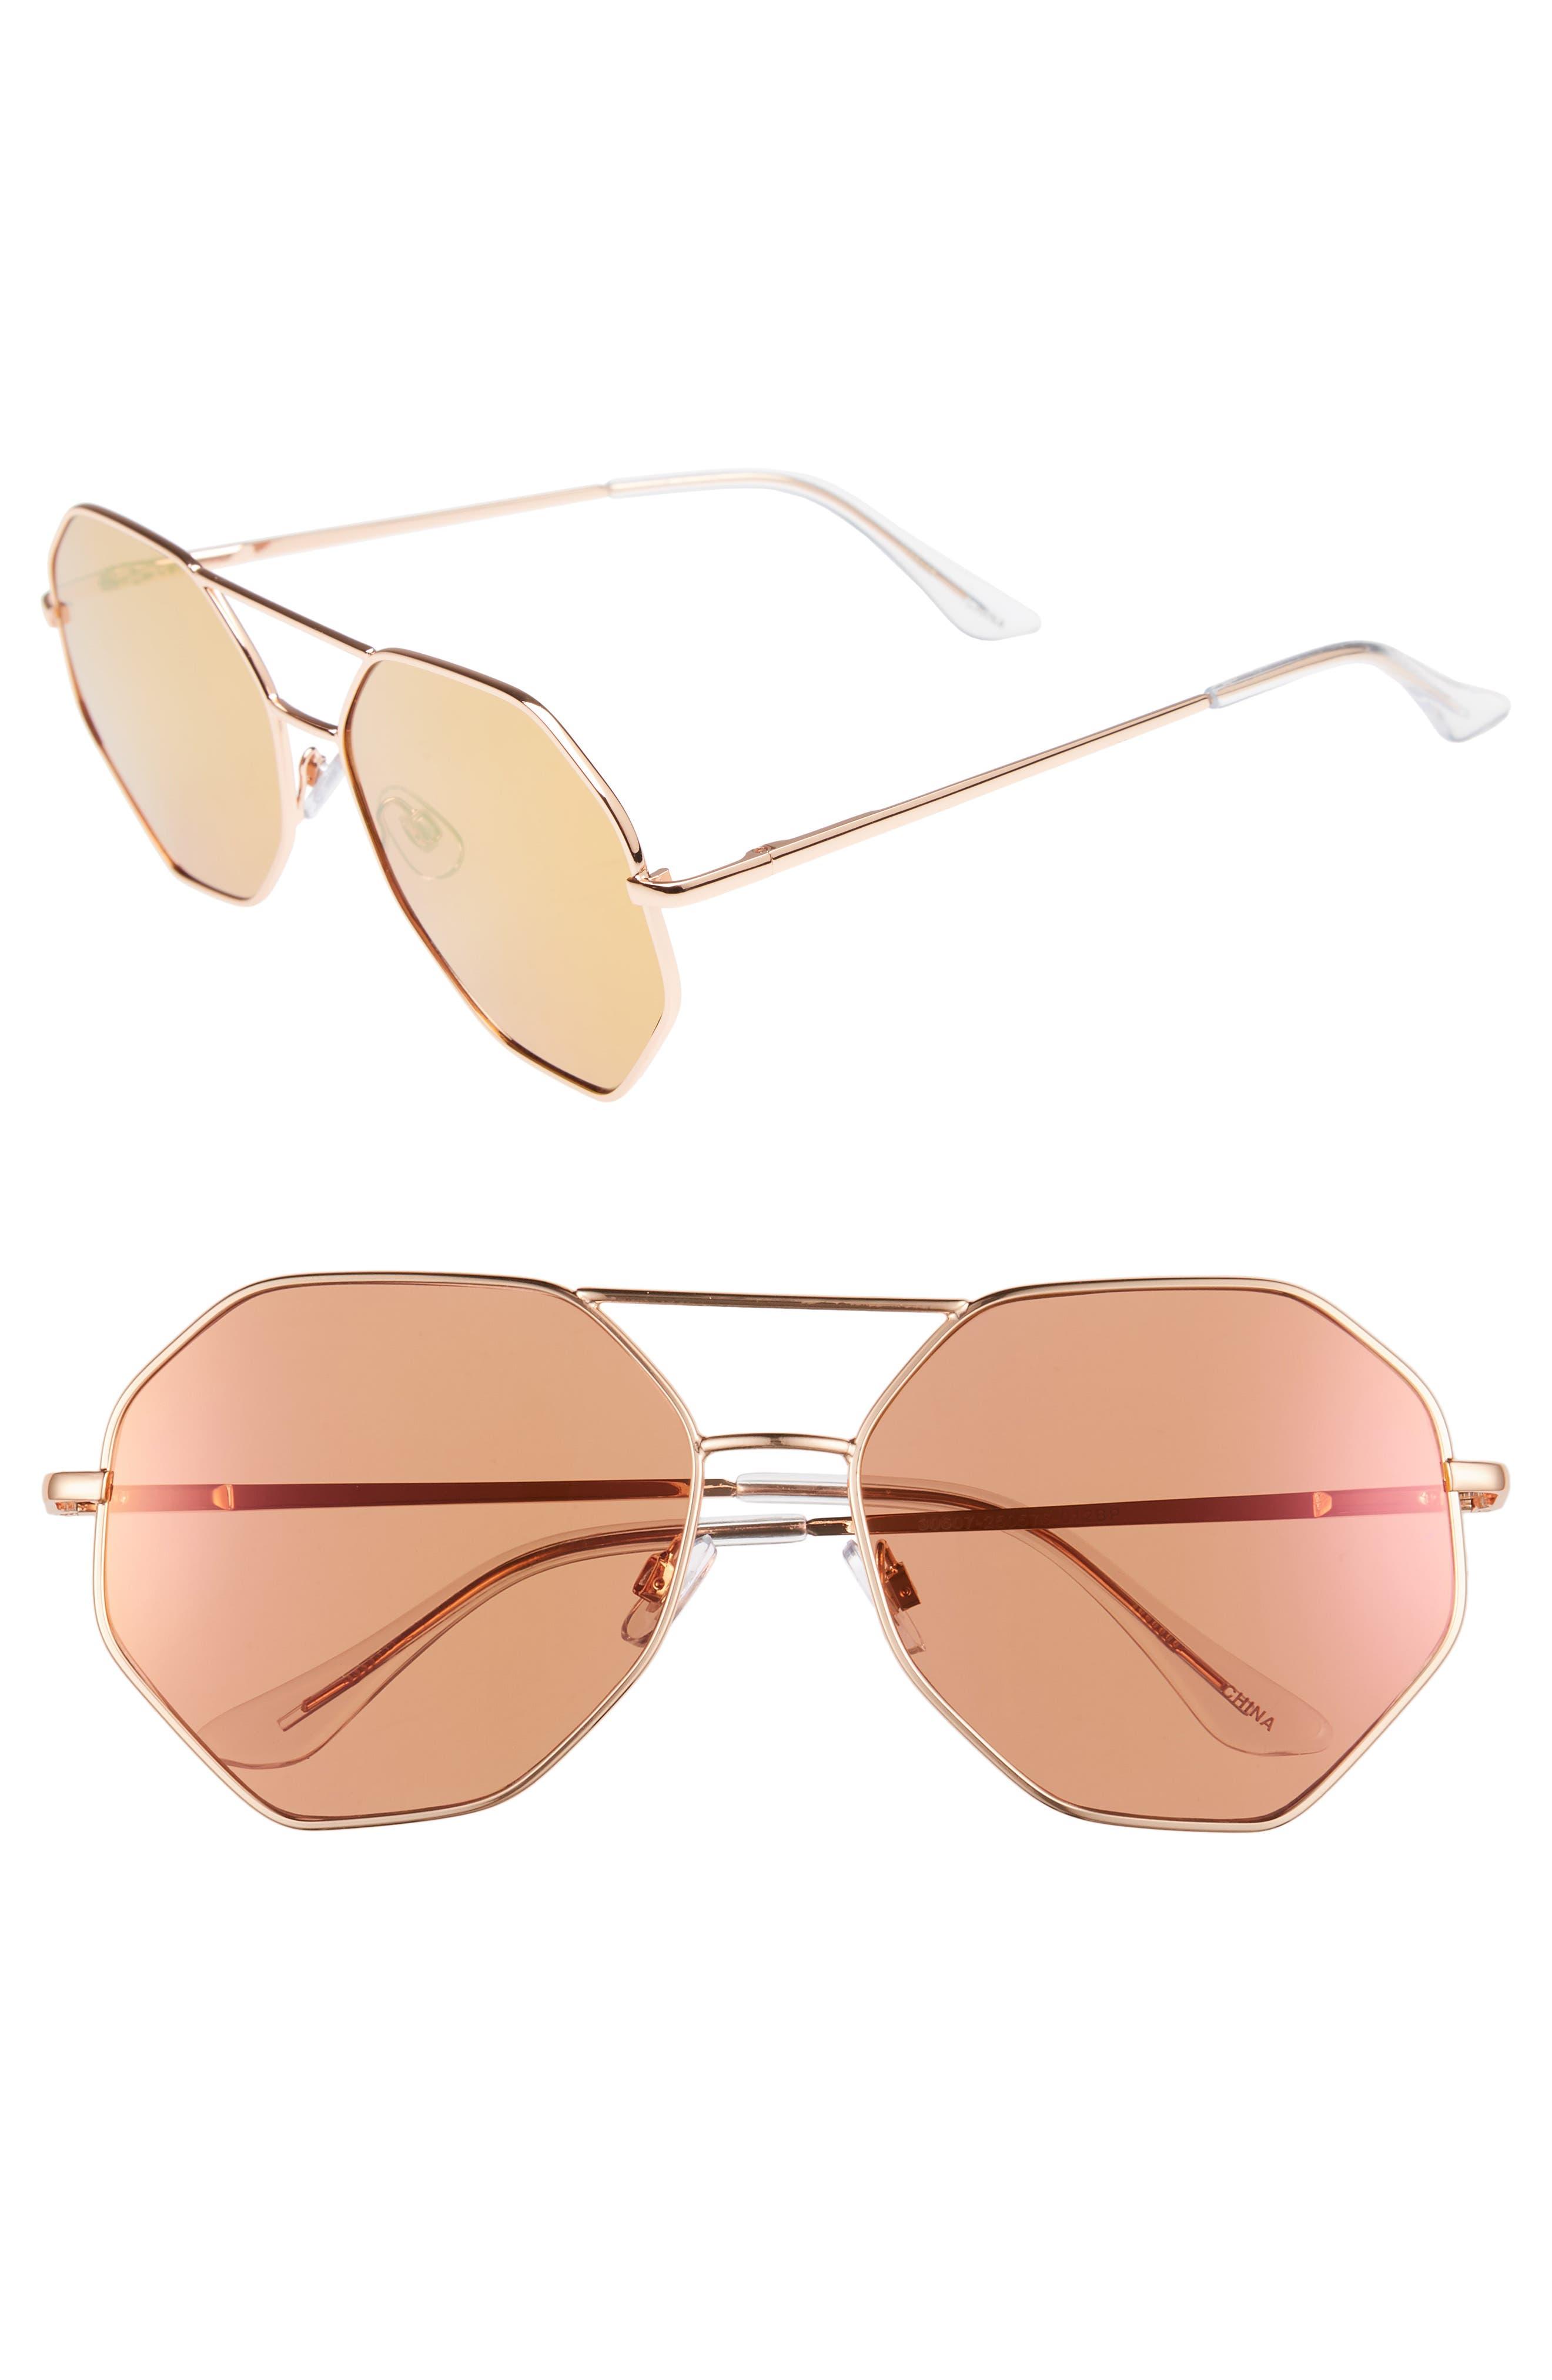 Hexcon Aviator Sunglasses,                             Main thumbnail 1, color,                             710